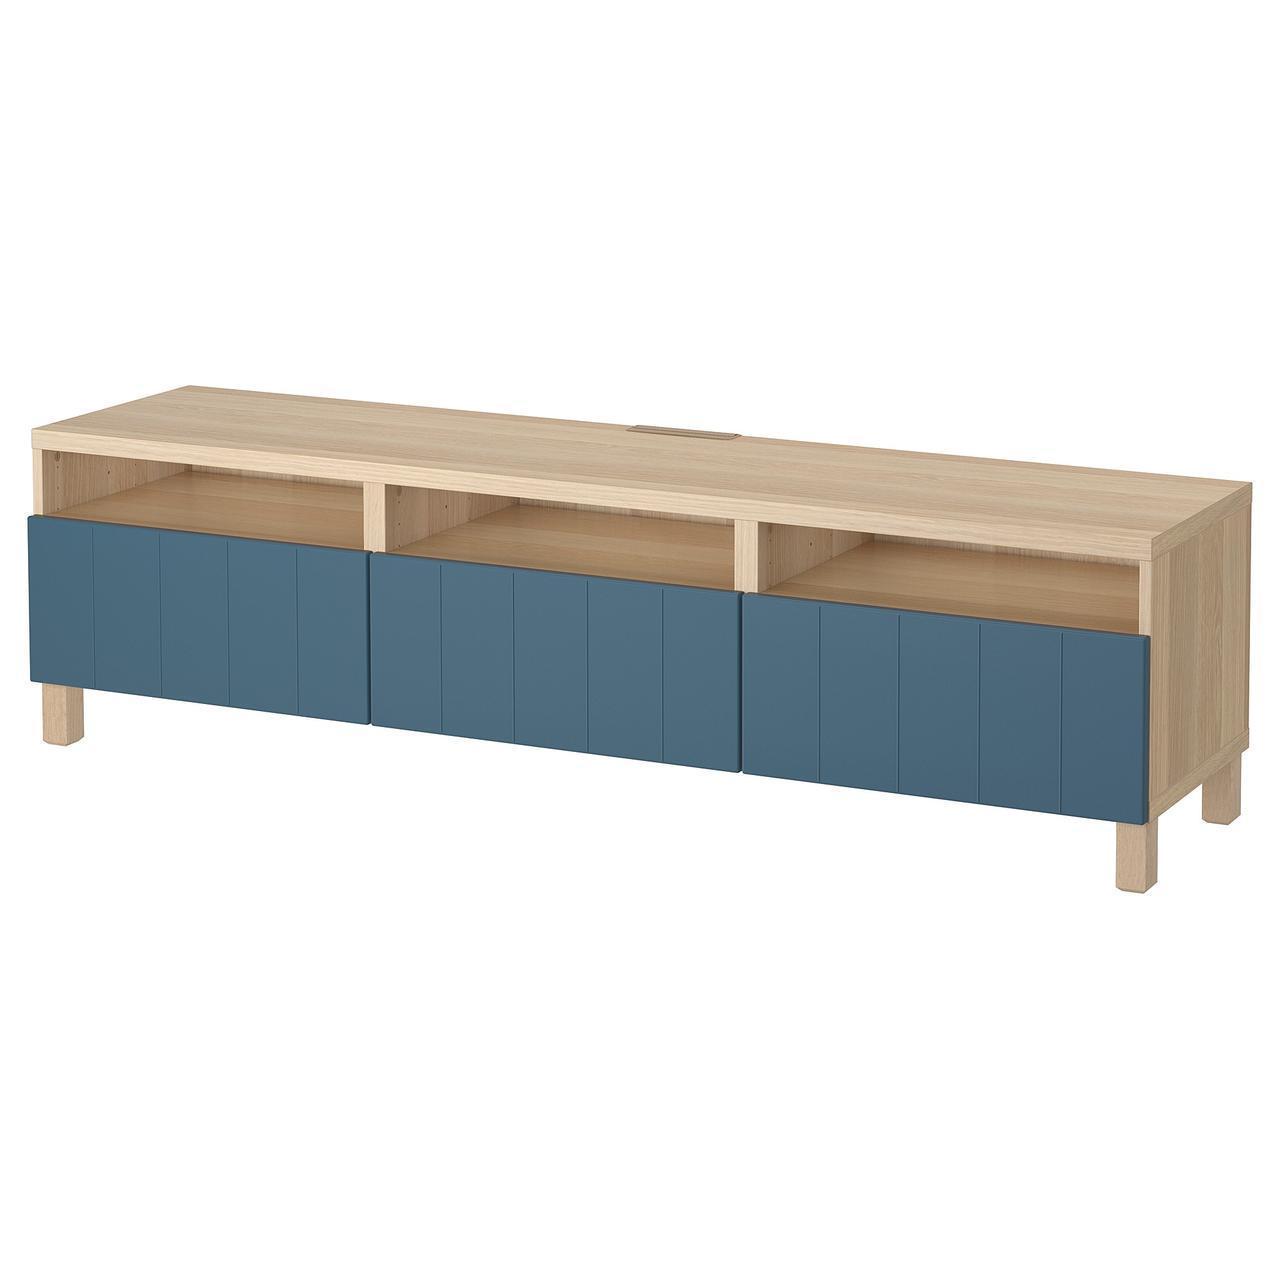 IKEA BESTA Тумба под телевизор с ящиками, белый дуб, Hallstavik синий  (192.058.03)